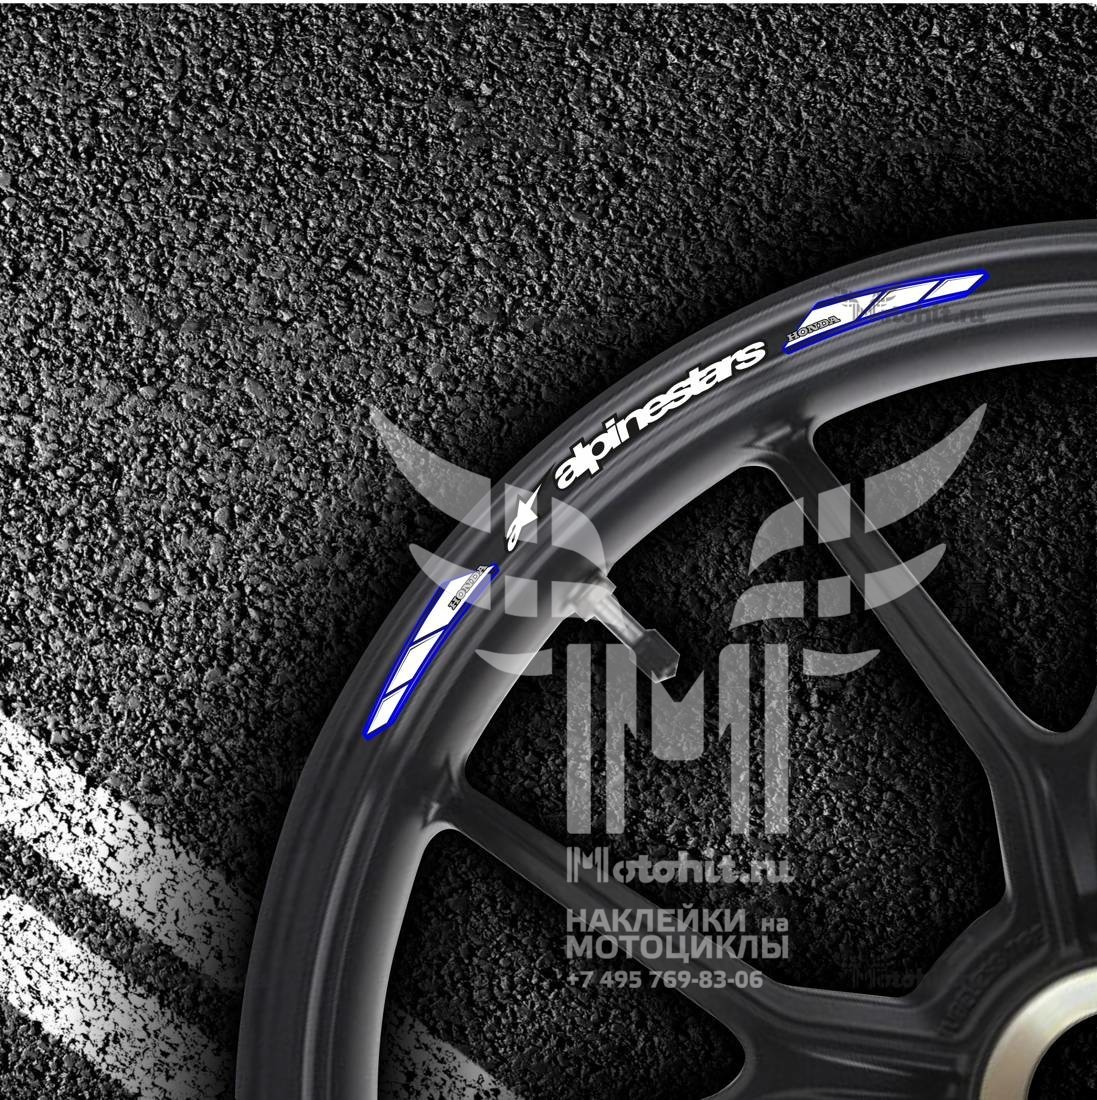 Комплект наклеек на обод колеса мотоцикла HONDA ALPINESTARS